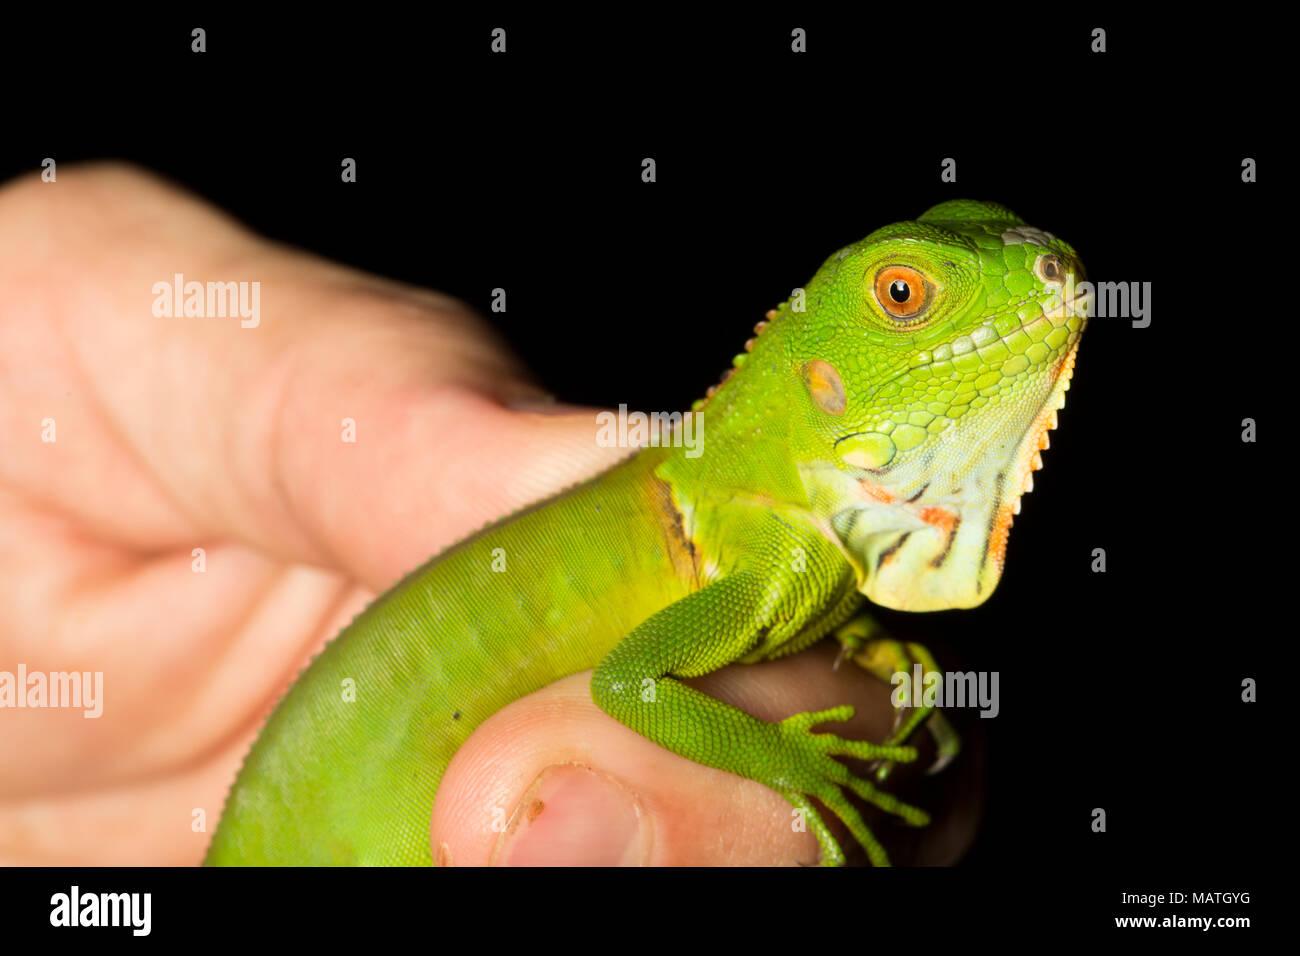 A juvenile green iguana, Iguana igunana, in the jungle of Suriname, near Bakhuis, South America - Stock Image